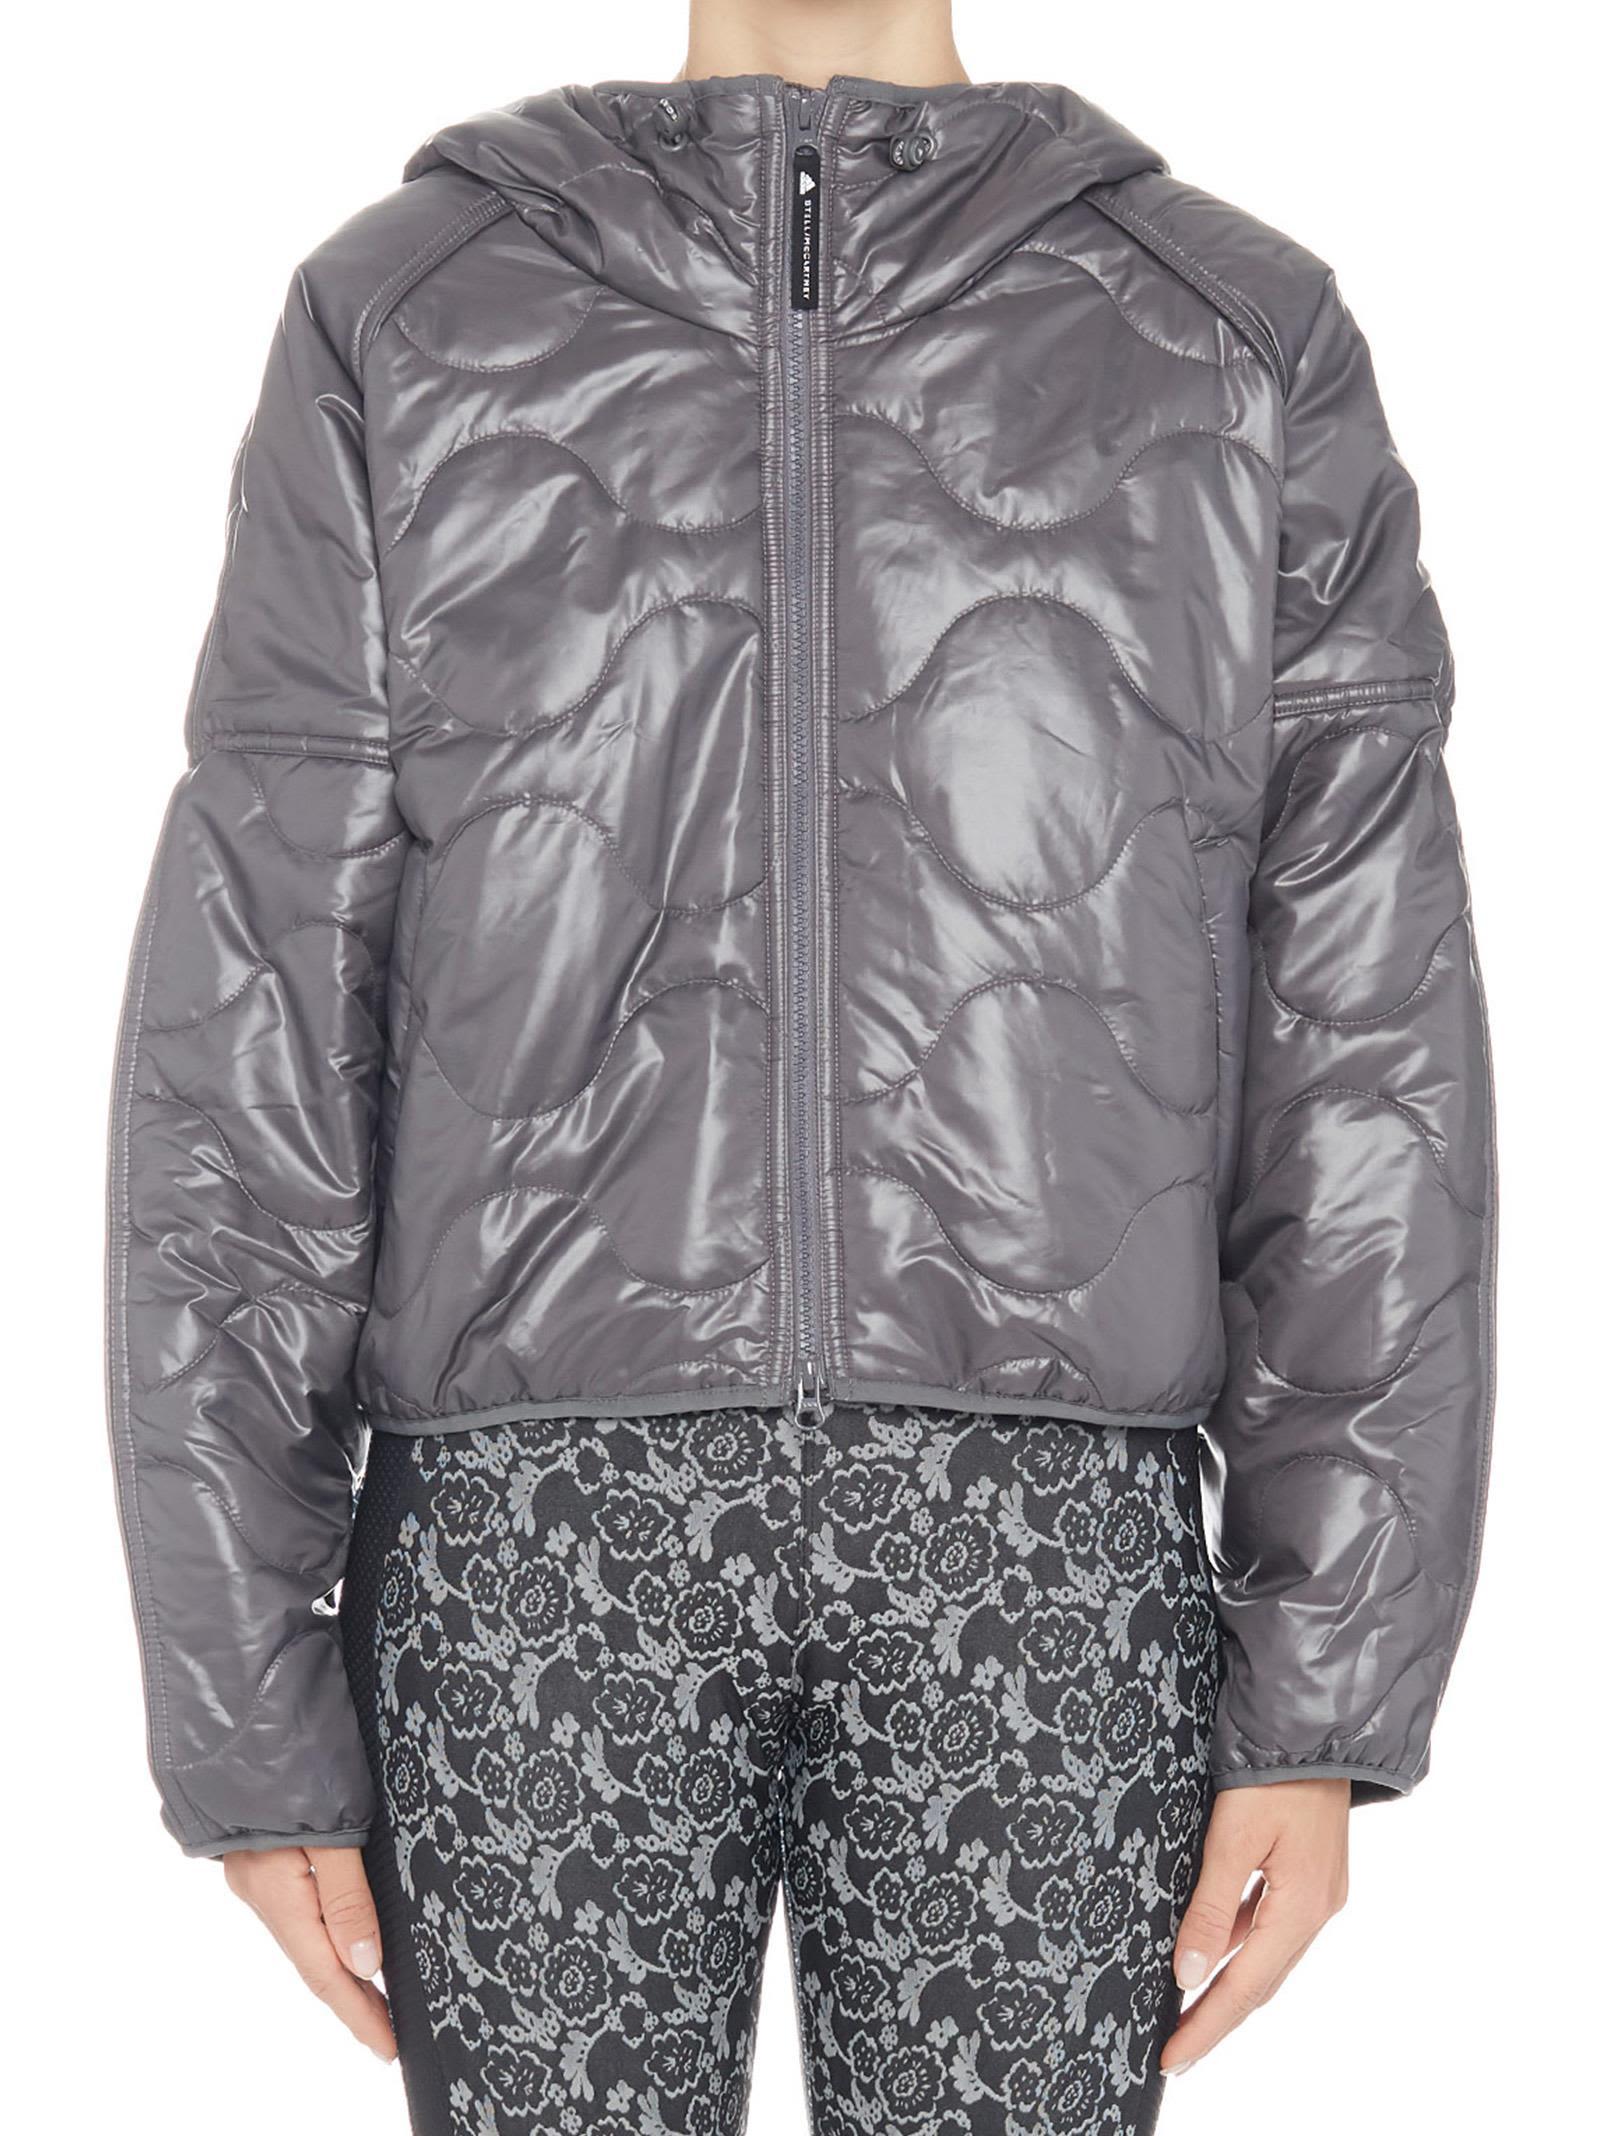 Adidas By Stella Mccartney Running Padded Jacket in Grey